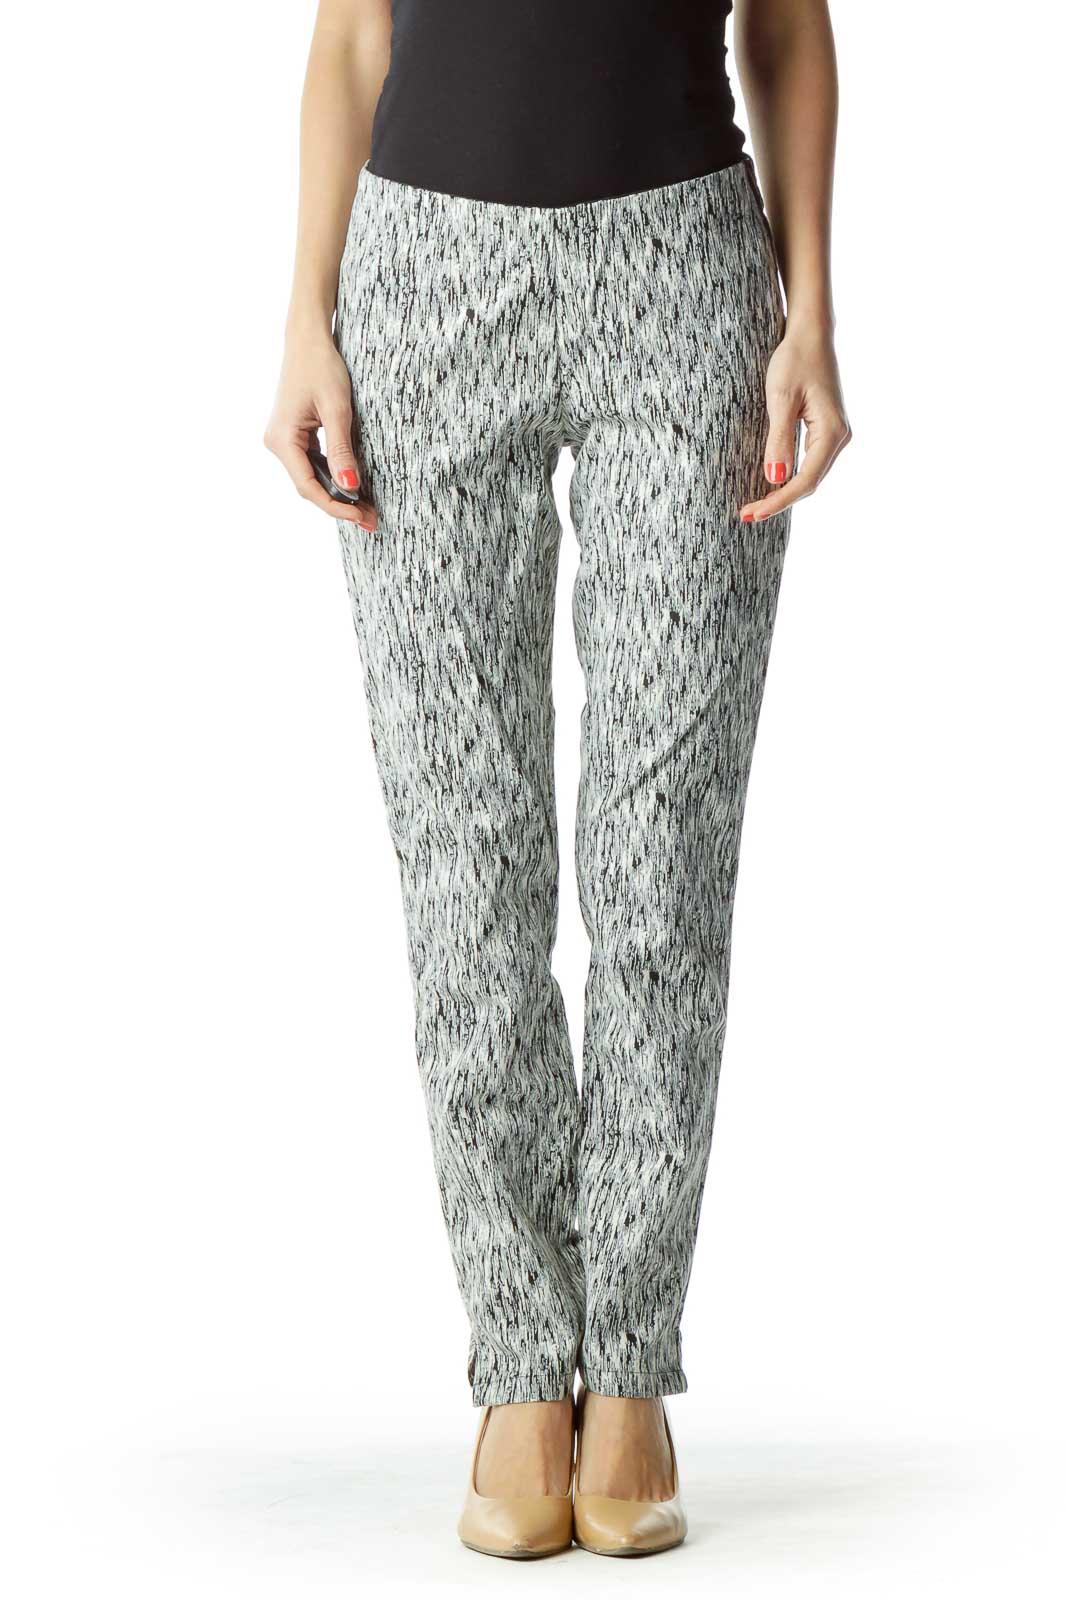 Black White Pattern Skinny Pant Front